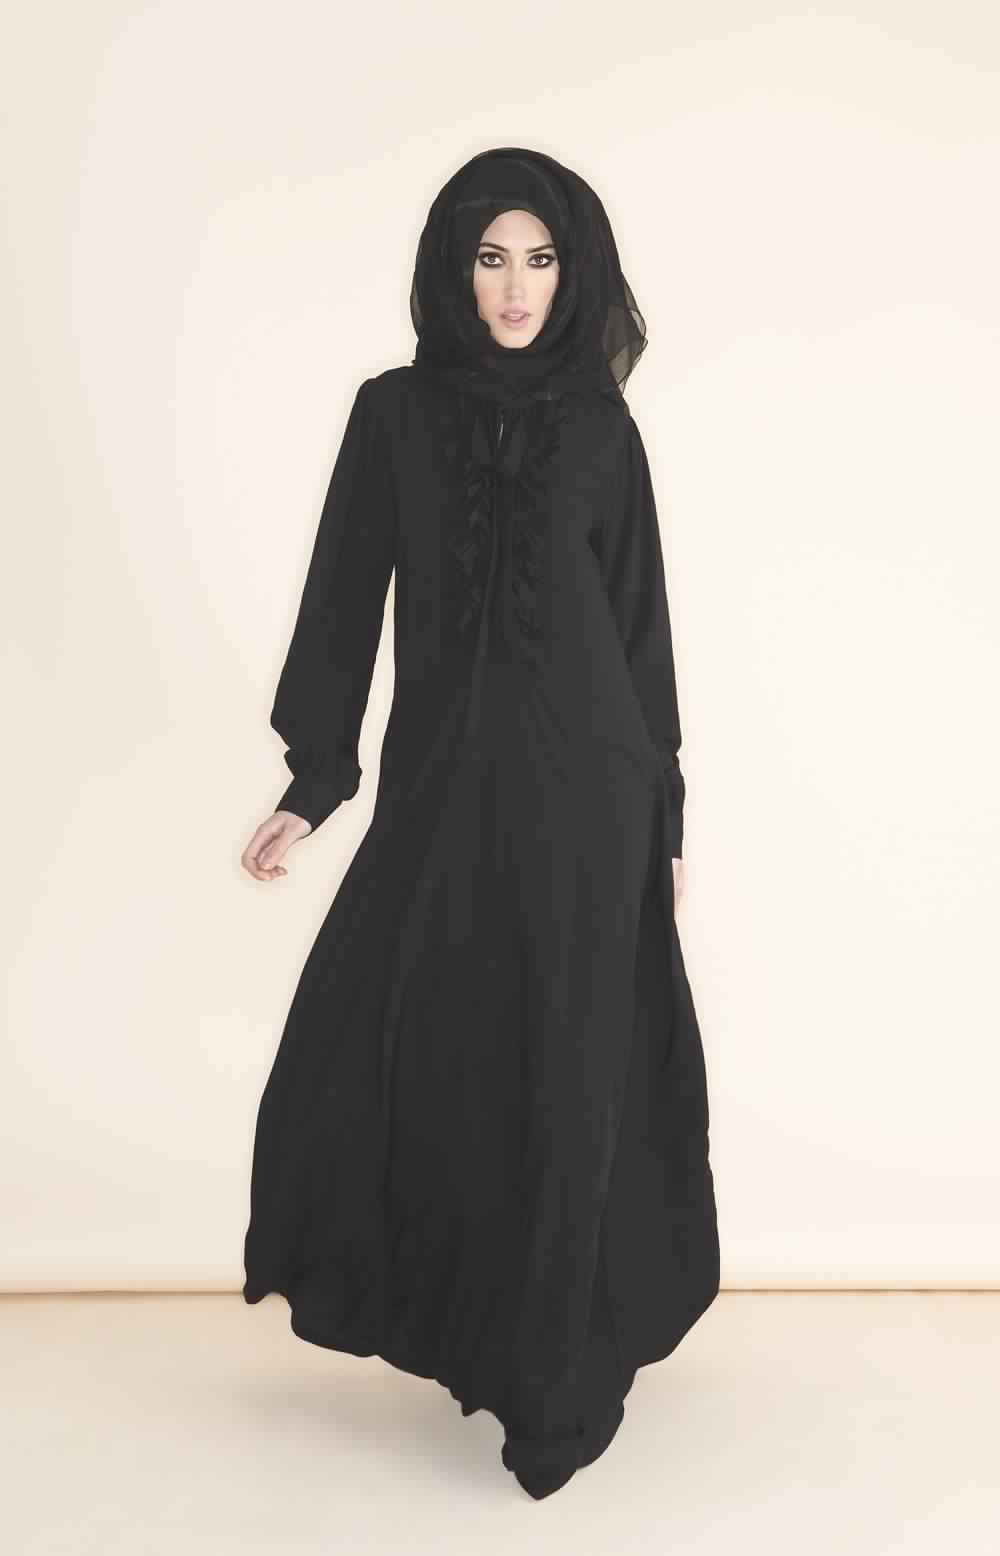 Style De Hijab Abaya Moderne Tr S Chic Et Tr S Moderne Hijab Et Voile Mode Style Mariage Et